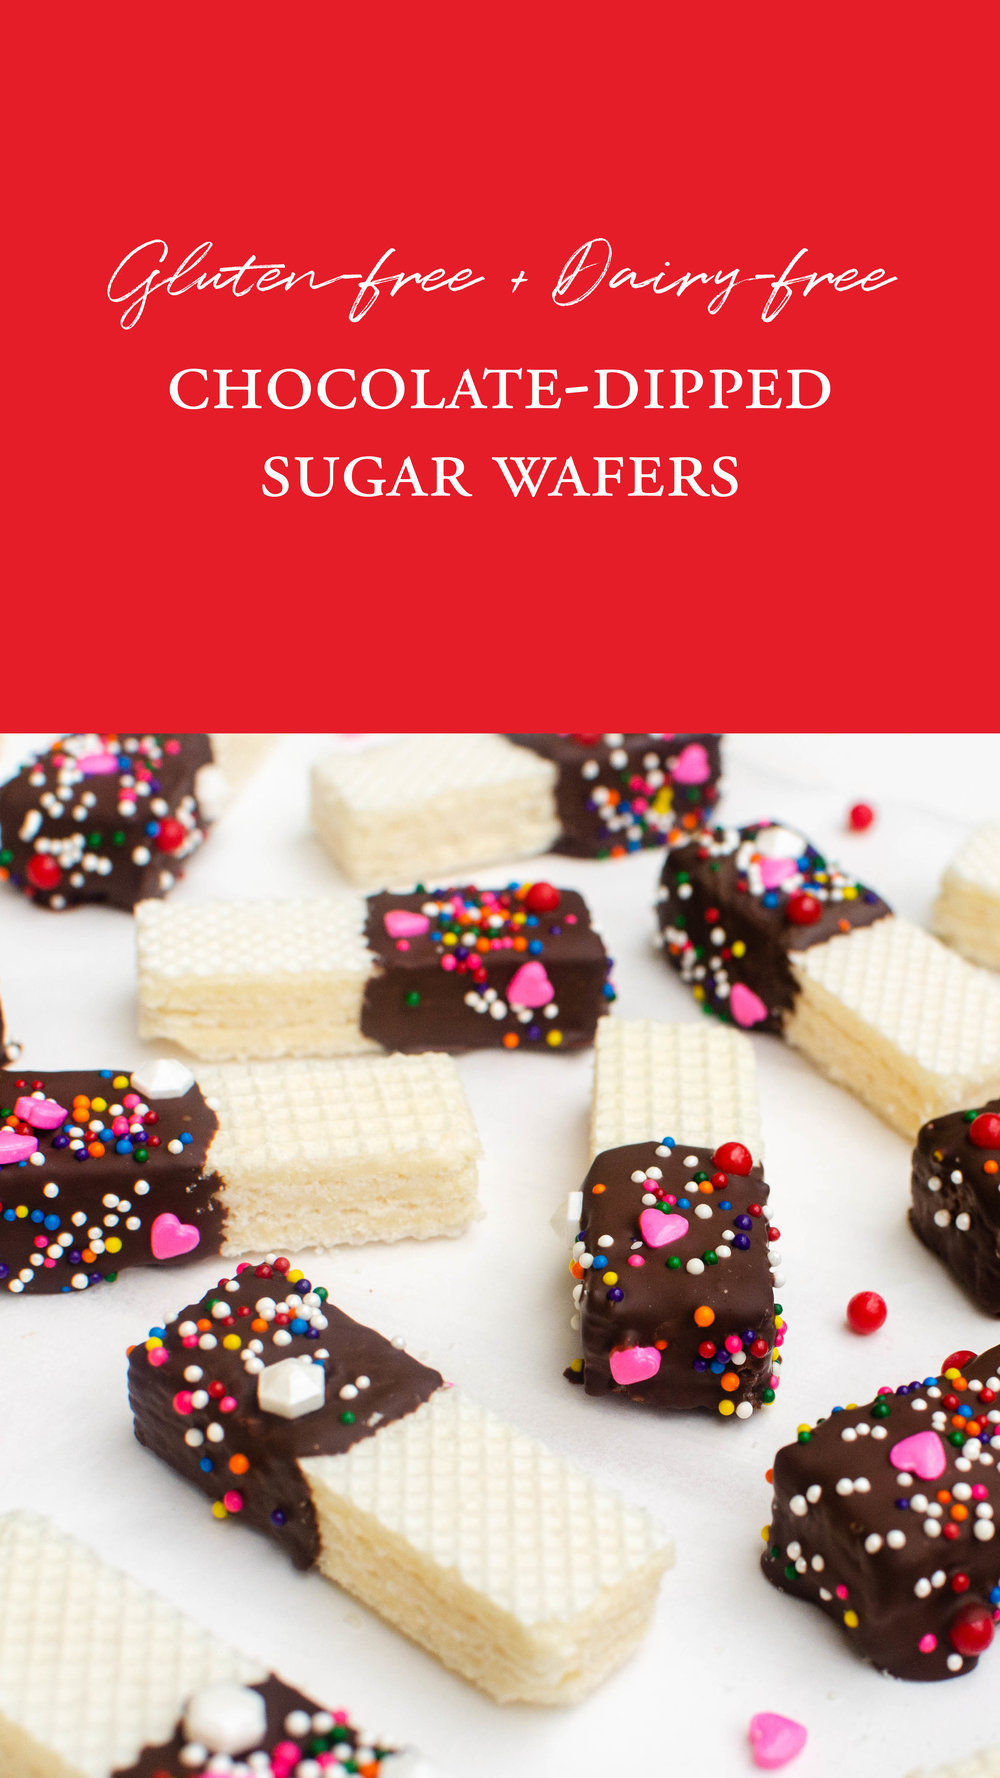 ChocolateDipped Sugar Wafers - Studioist2.jpg